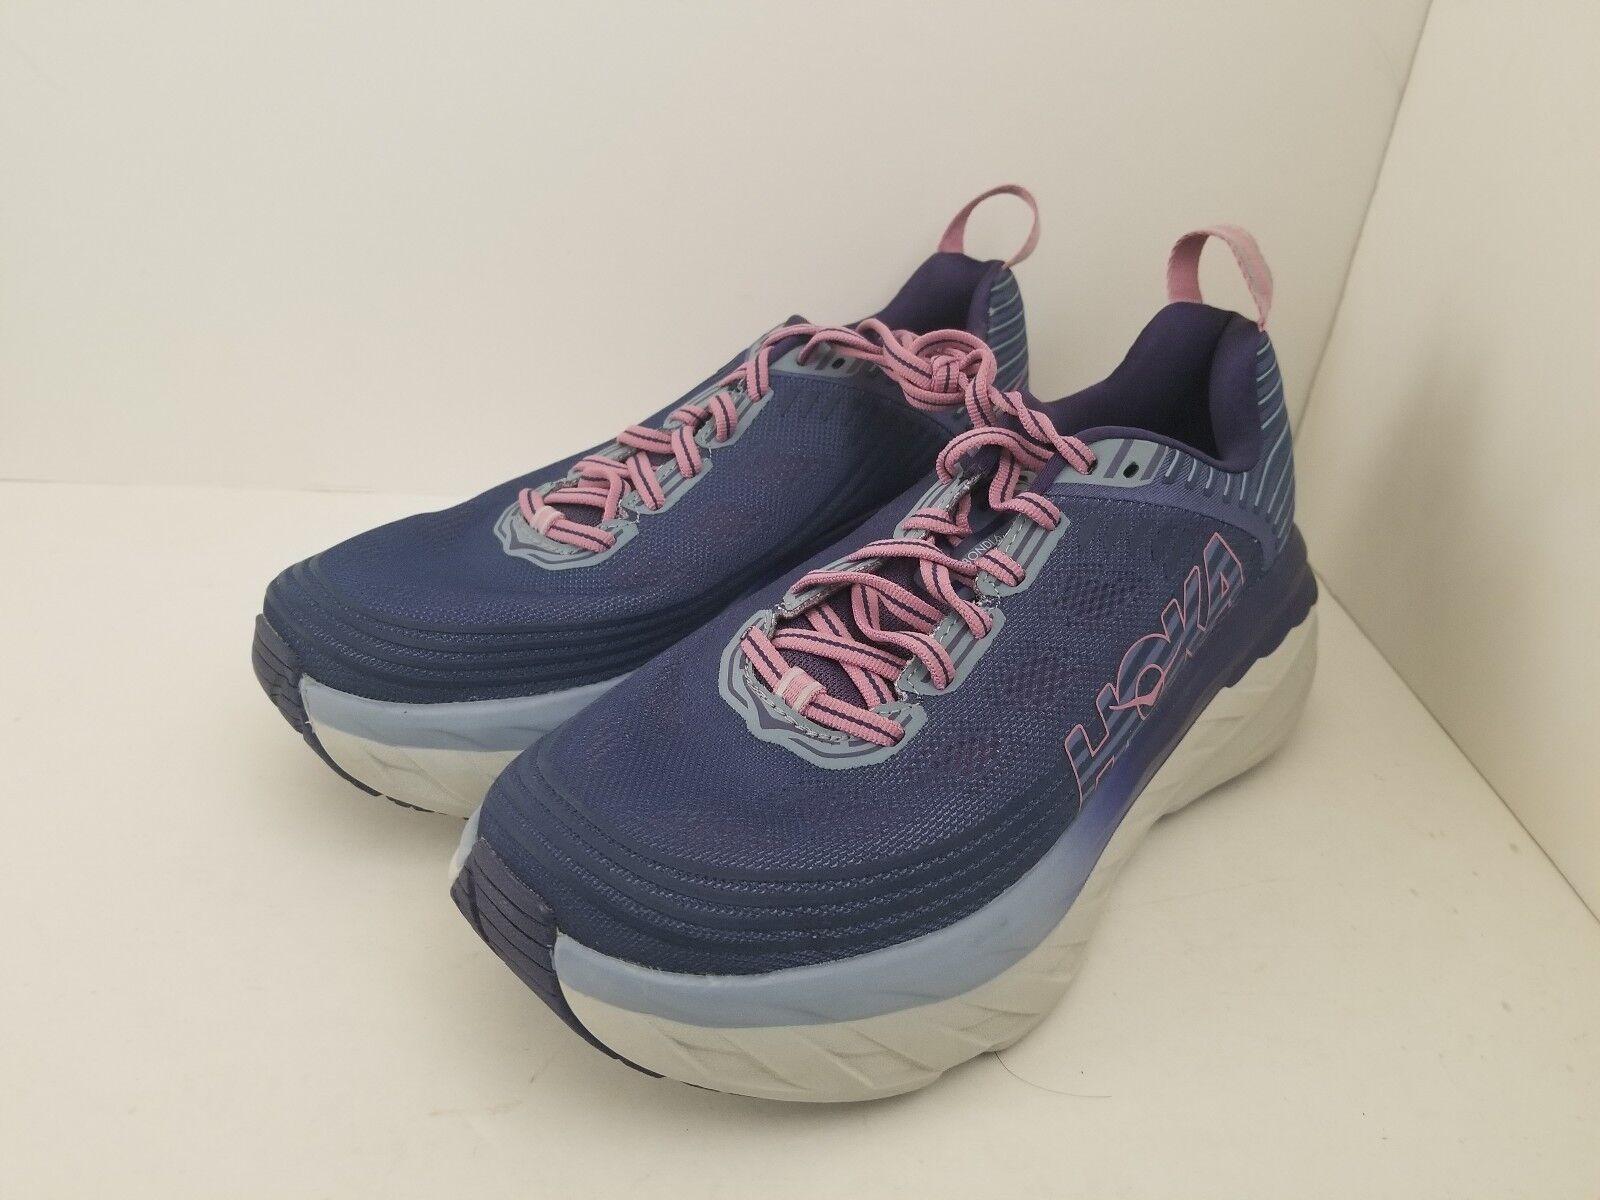 HOKA Bondi 6 pour Femme Taille 10.5 Max Amorti Premium Chaussures De Course Retail  150